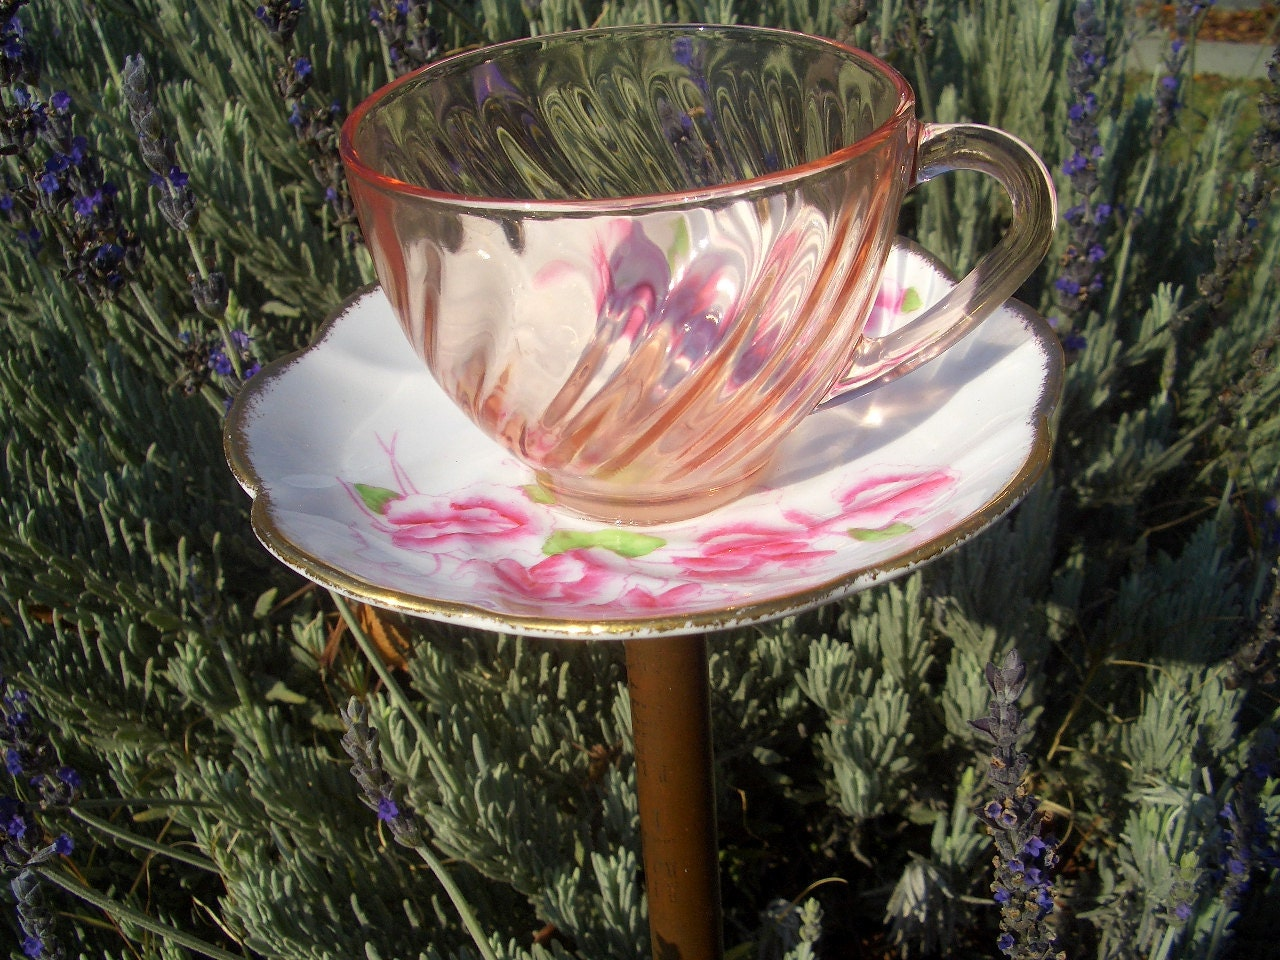 Bird feeder tea cup upcycled garden decor by for Upcycled yard decor